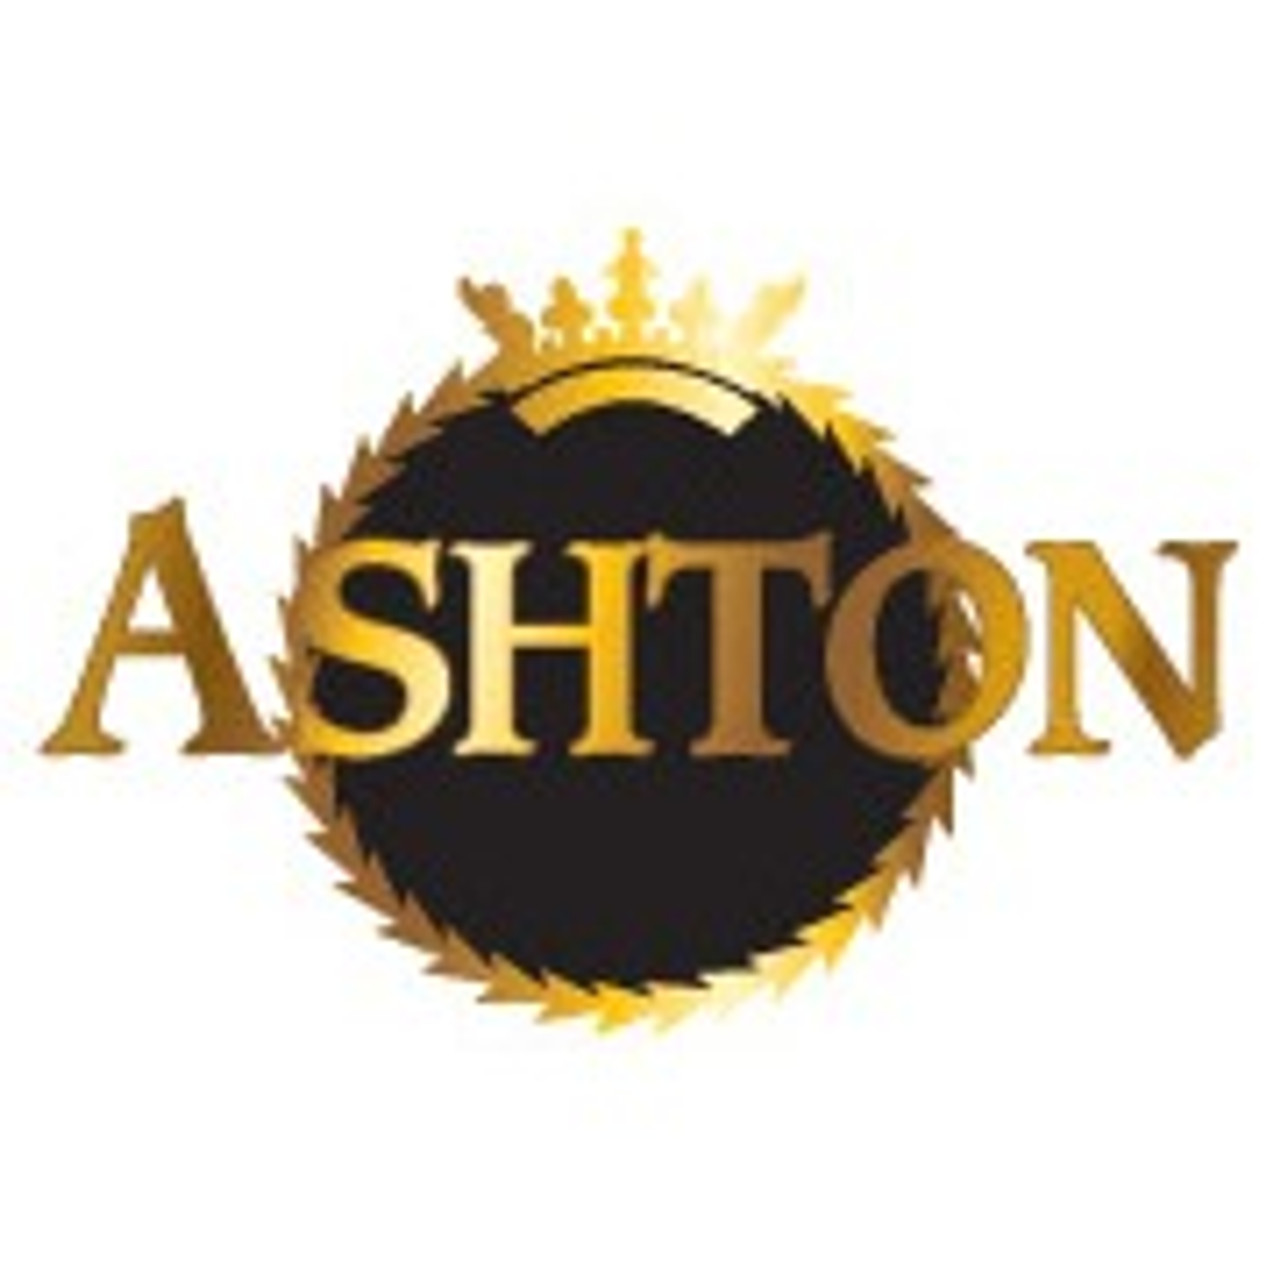 Ashton Cigarillos Connecticut Cigars - 3.75 x 26 (10 Packs of 10 (100 Total))